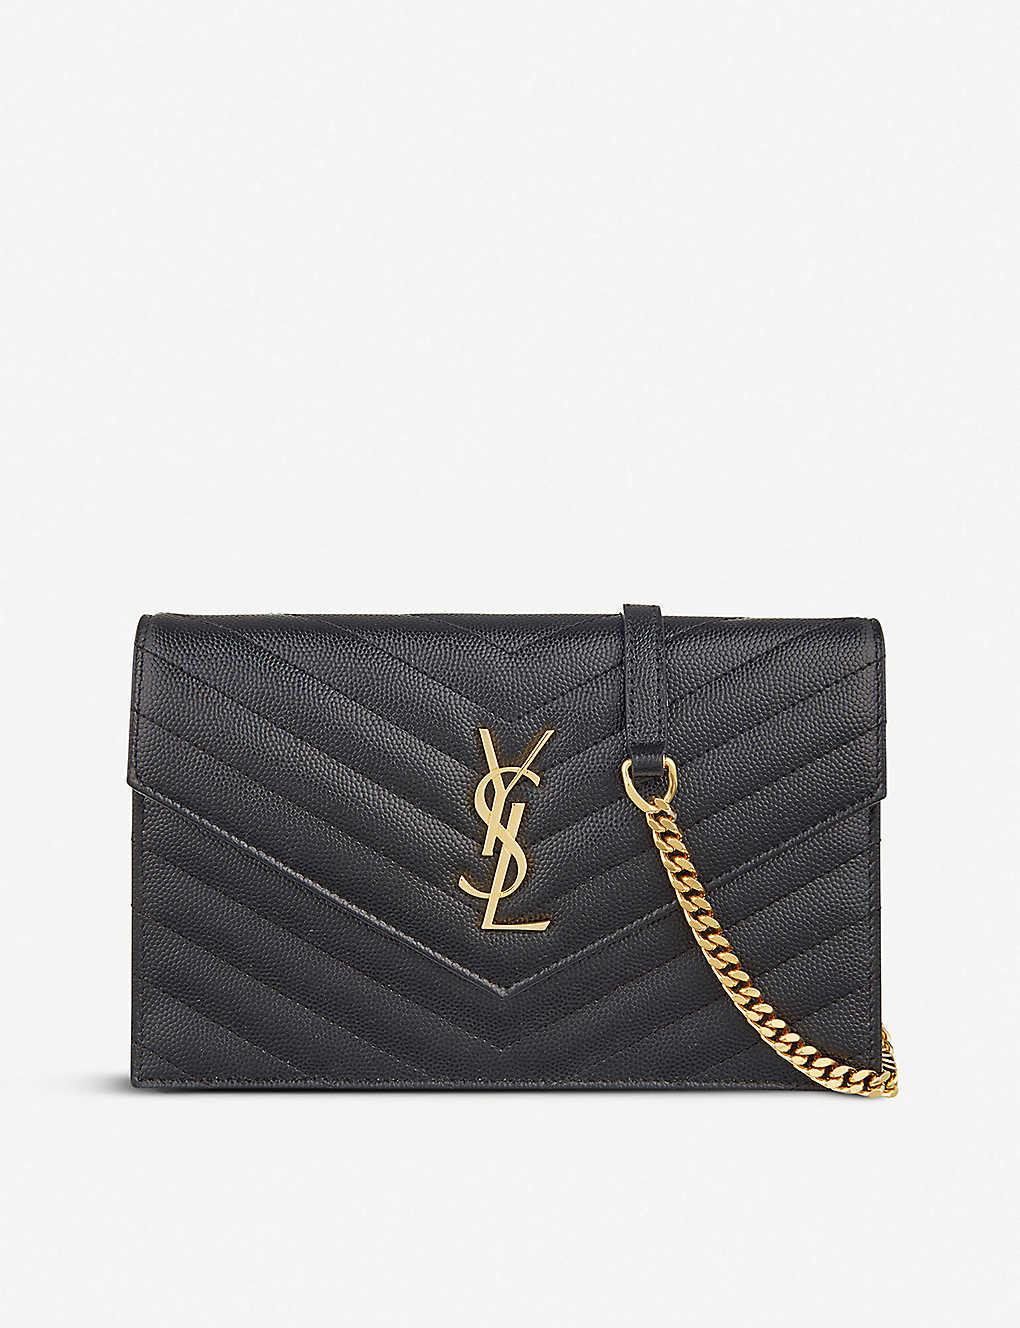 SAINT LAURENT: Monogram leather cross-body bag